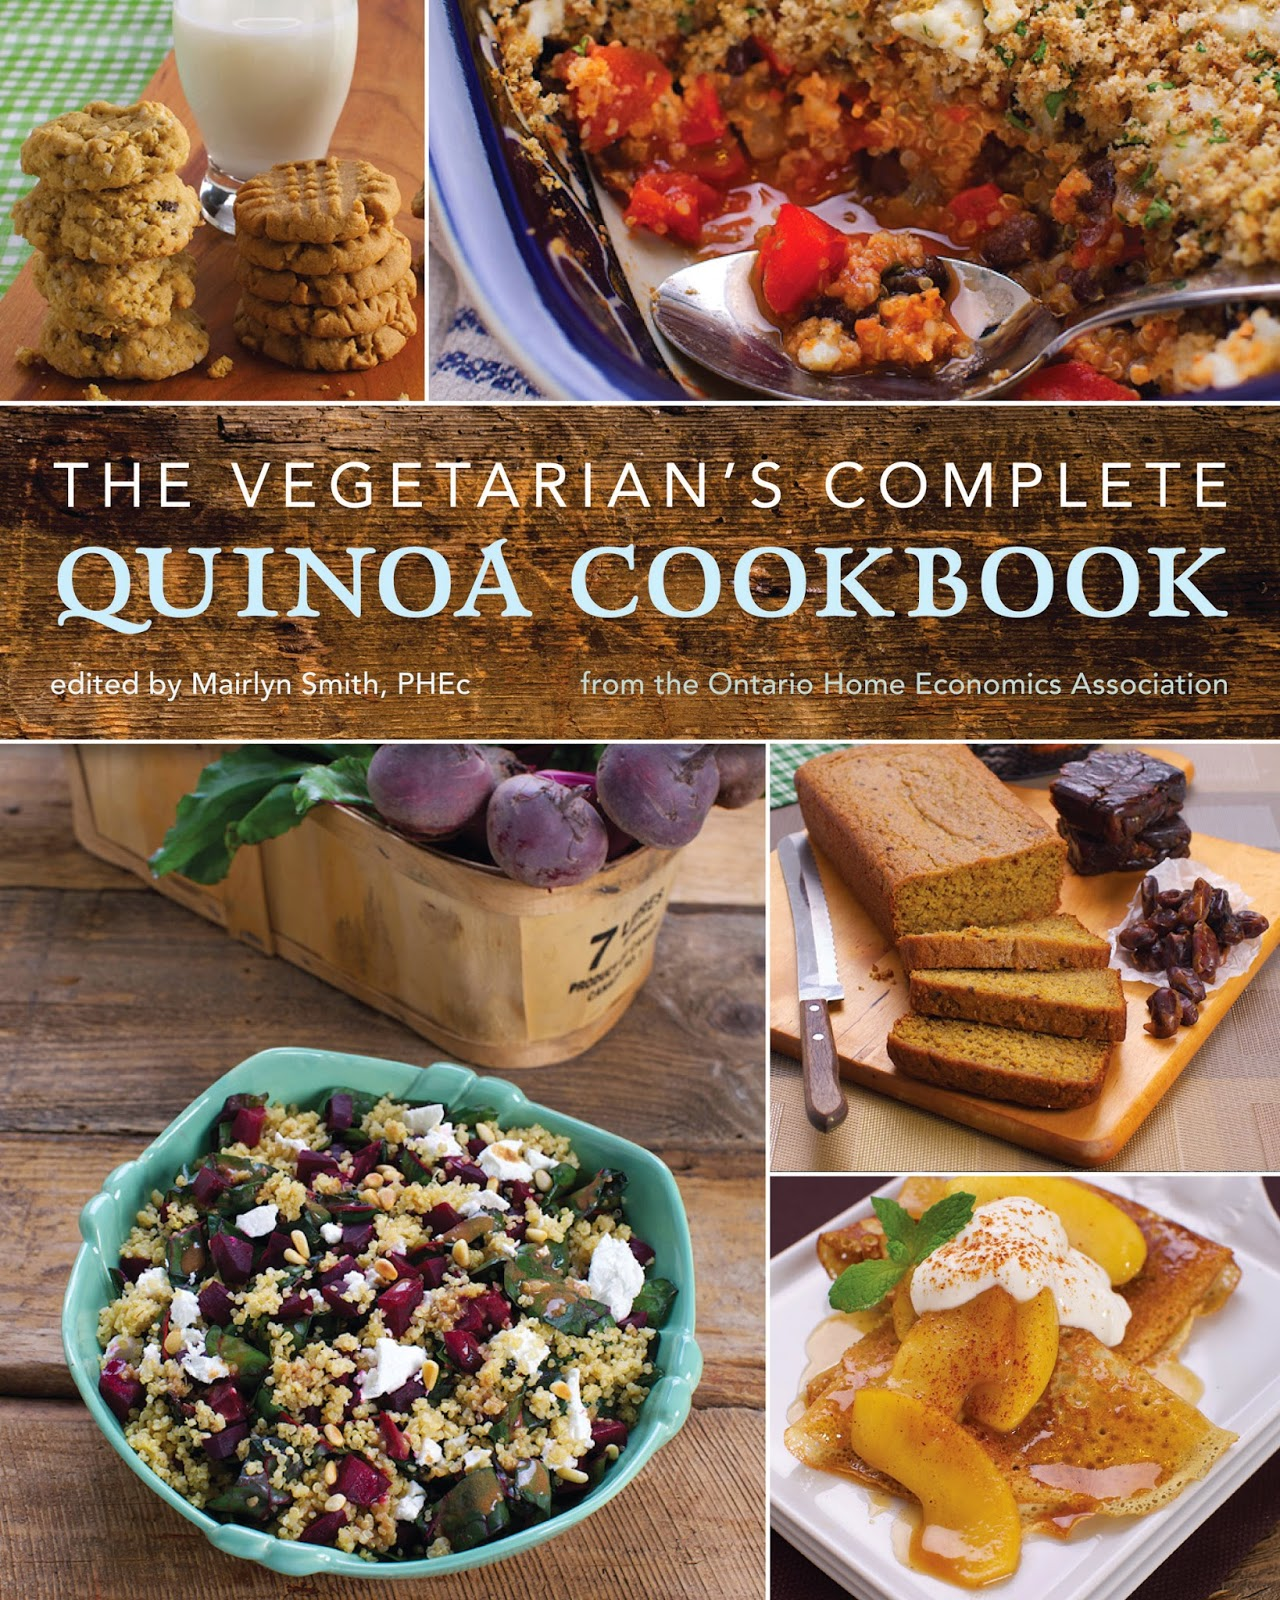 Quick Weeknight Chili & The Vegetarian's Complete Quinoa Cookbook (Recipe & Book Review)